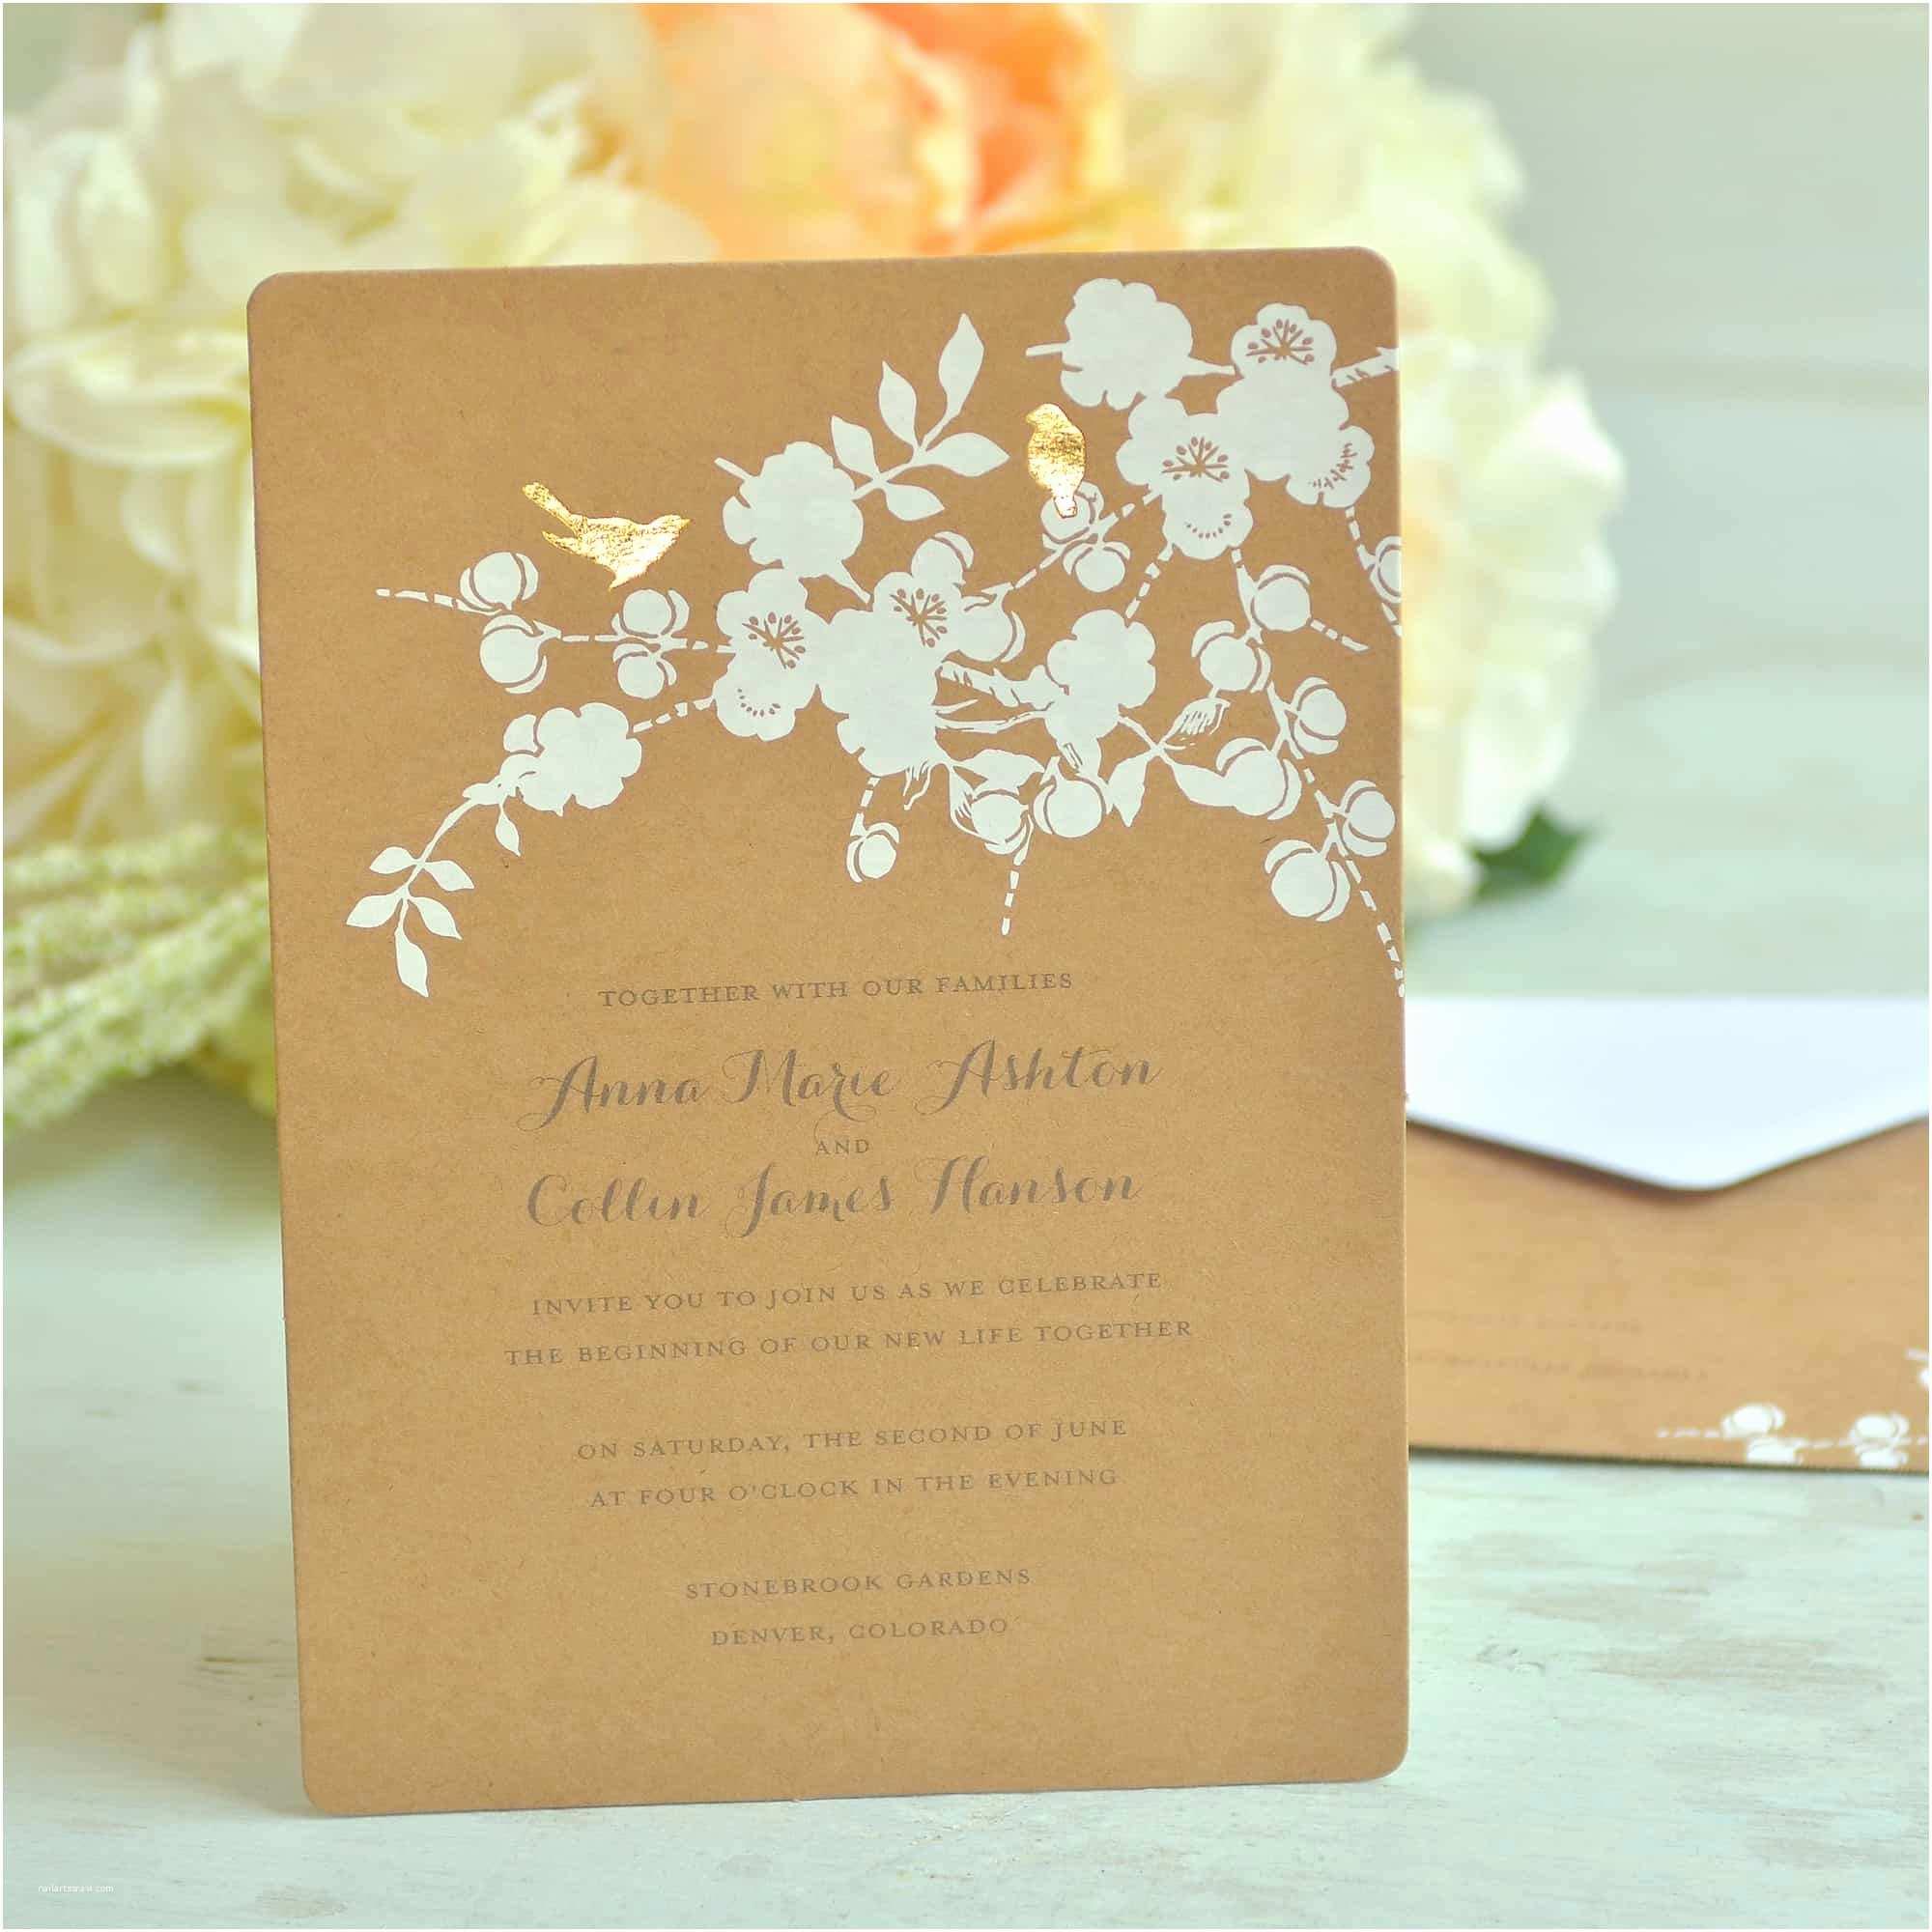 Walmart Wedding Invitations the Walmart Wedding Invitations Templates